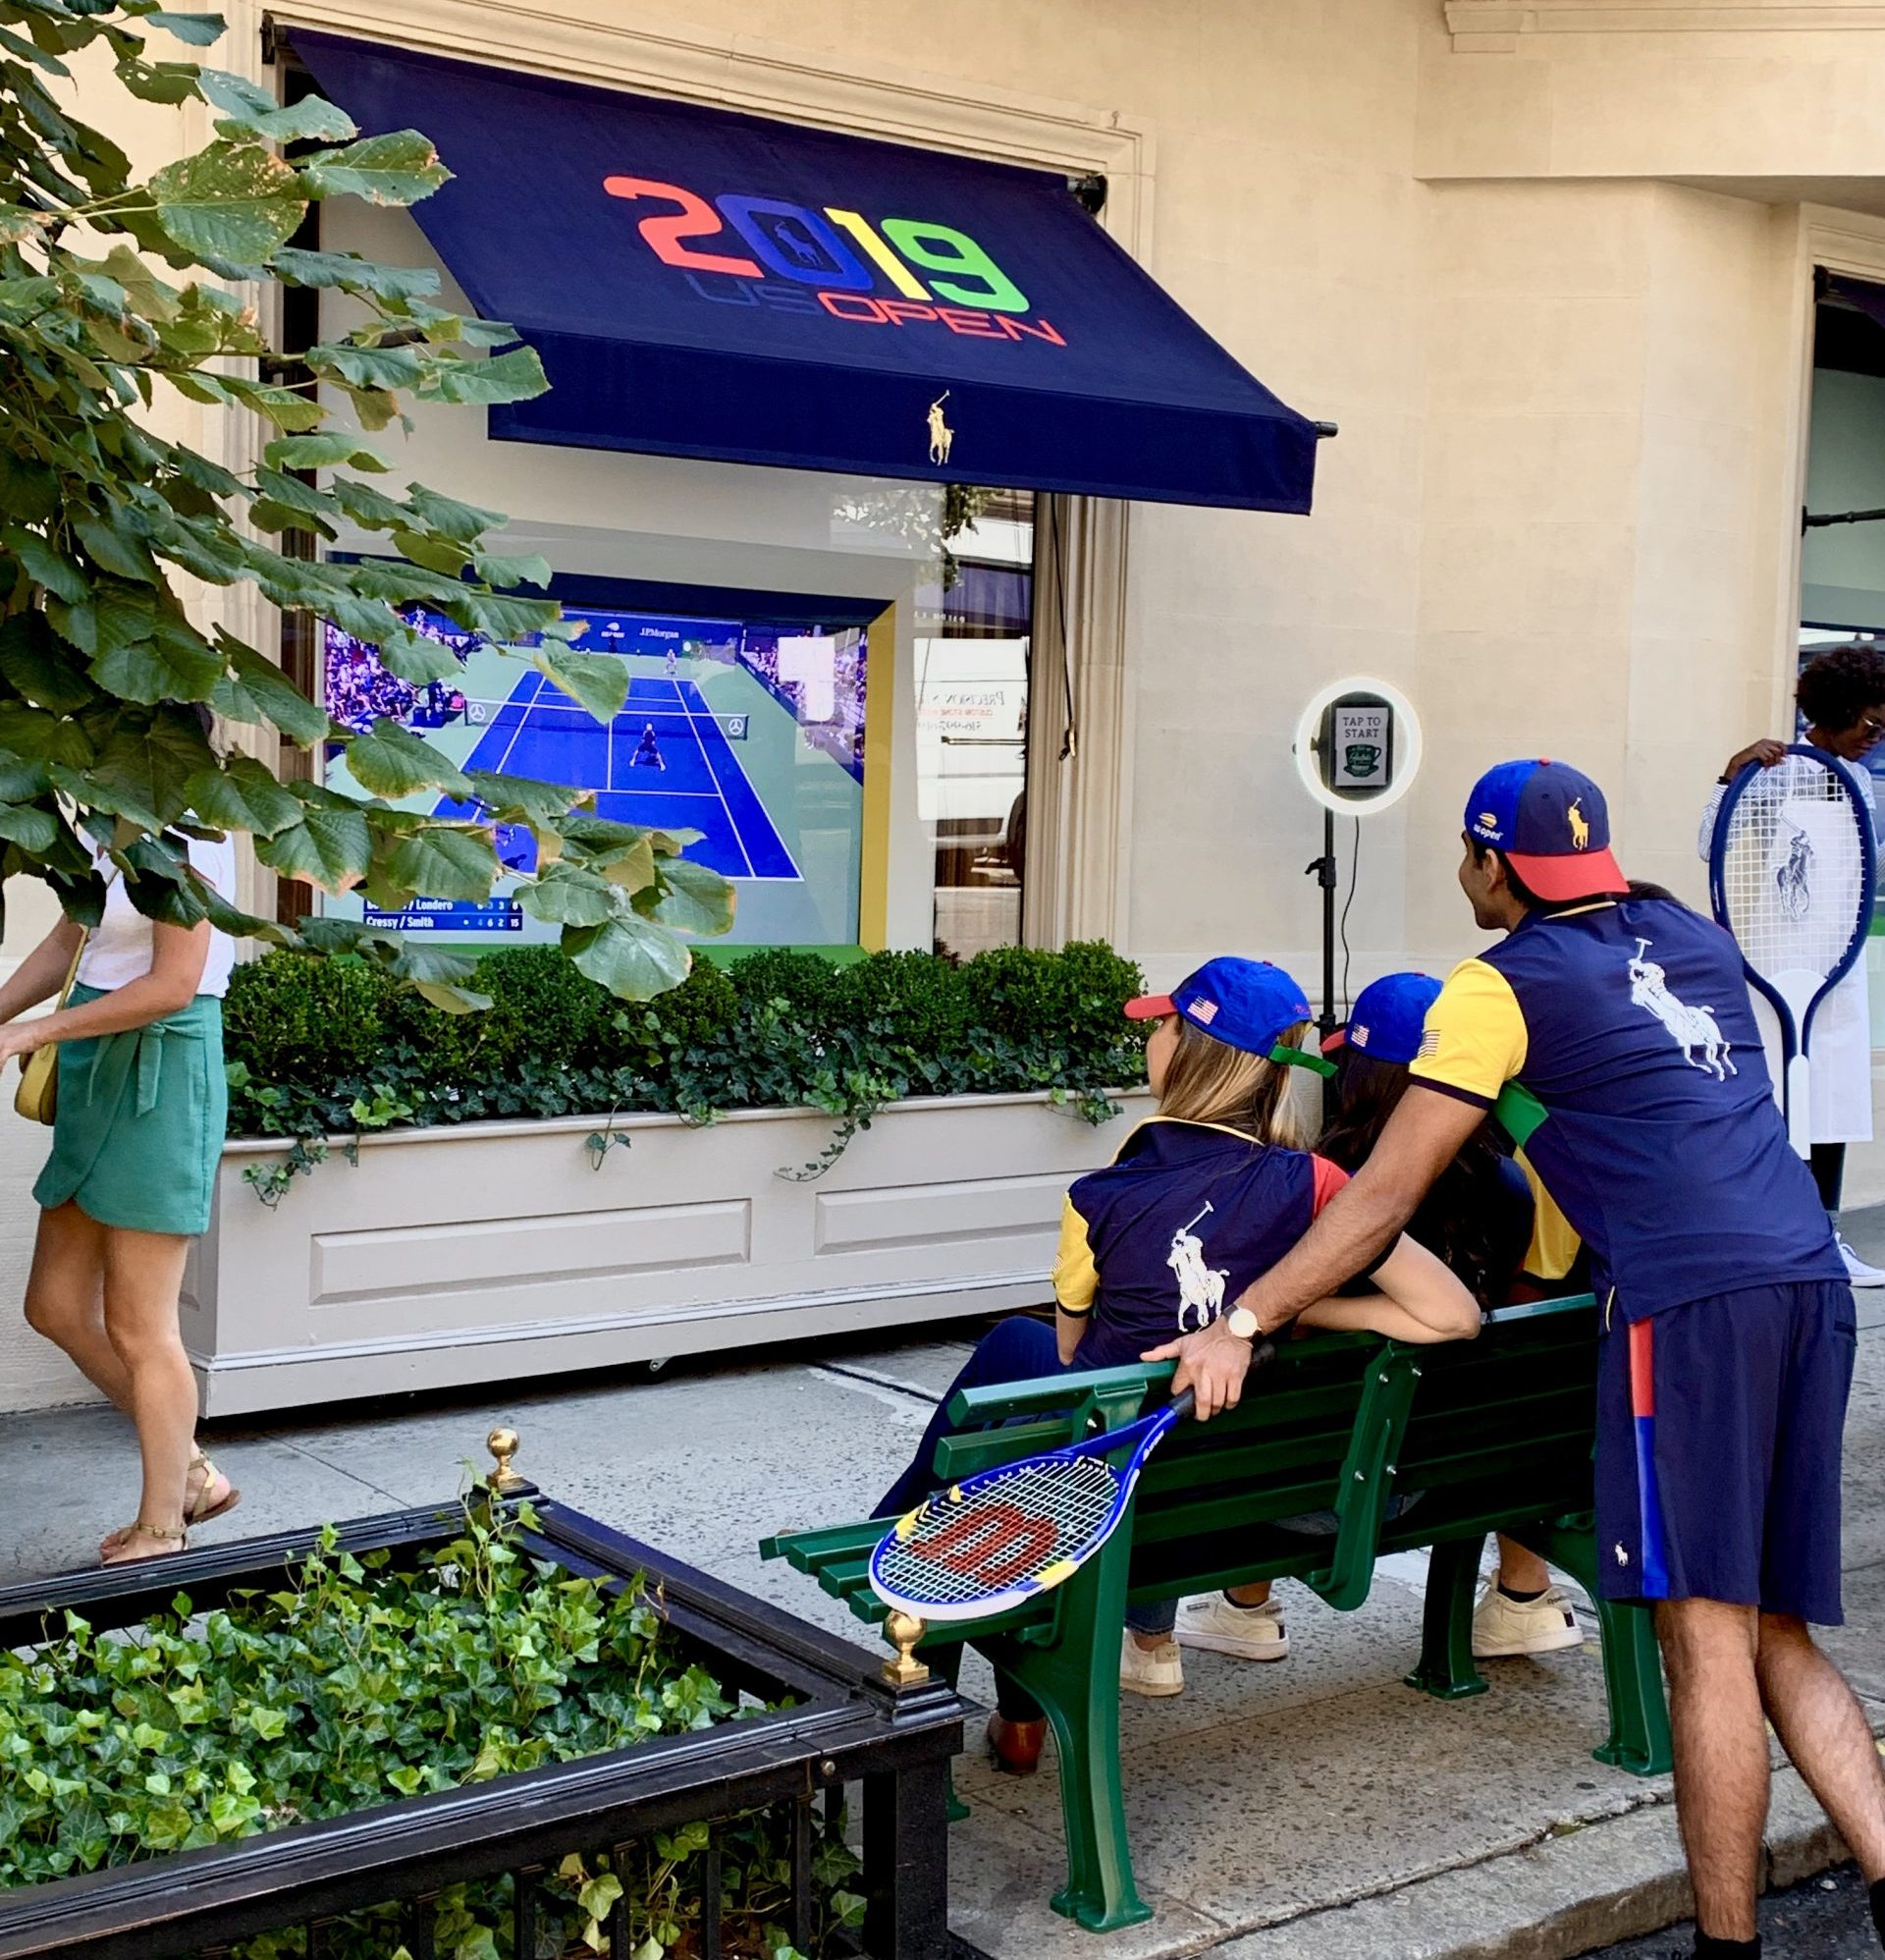 Ralph Lauren 2019 US Open Street Marketing Case Study